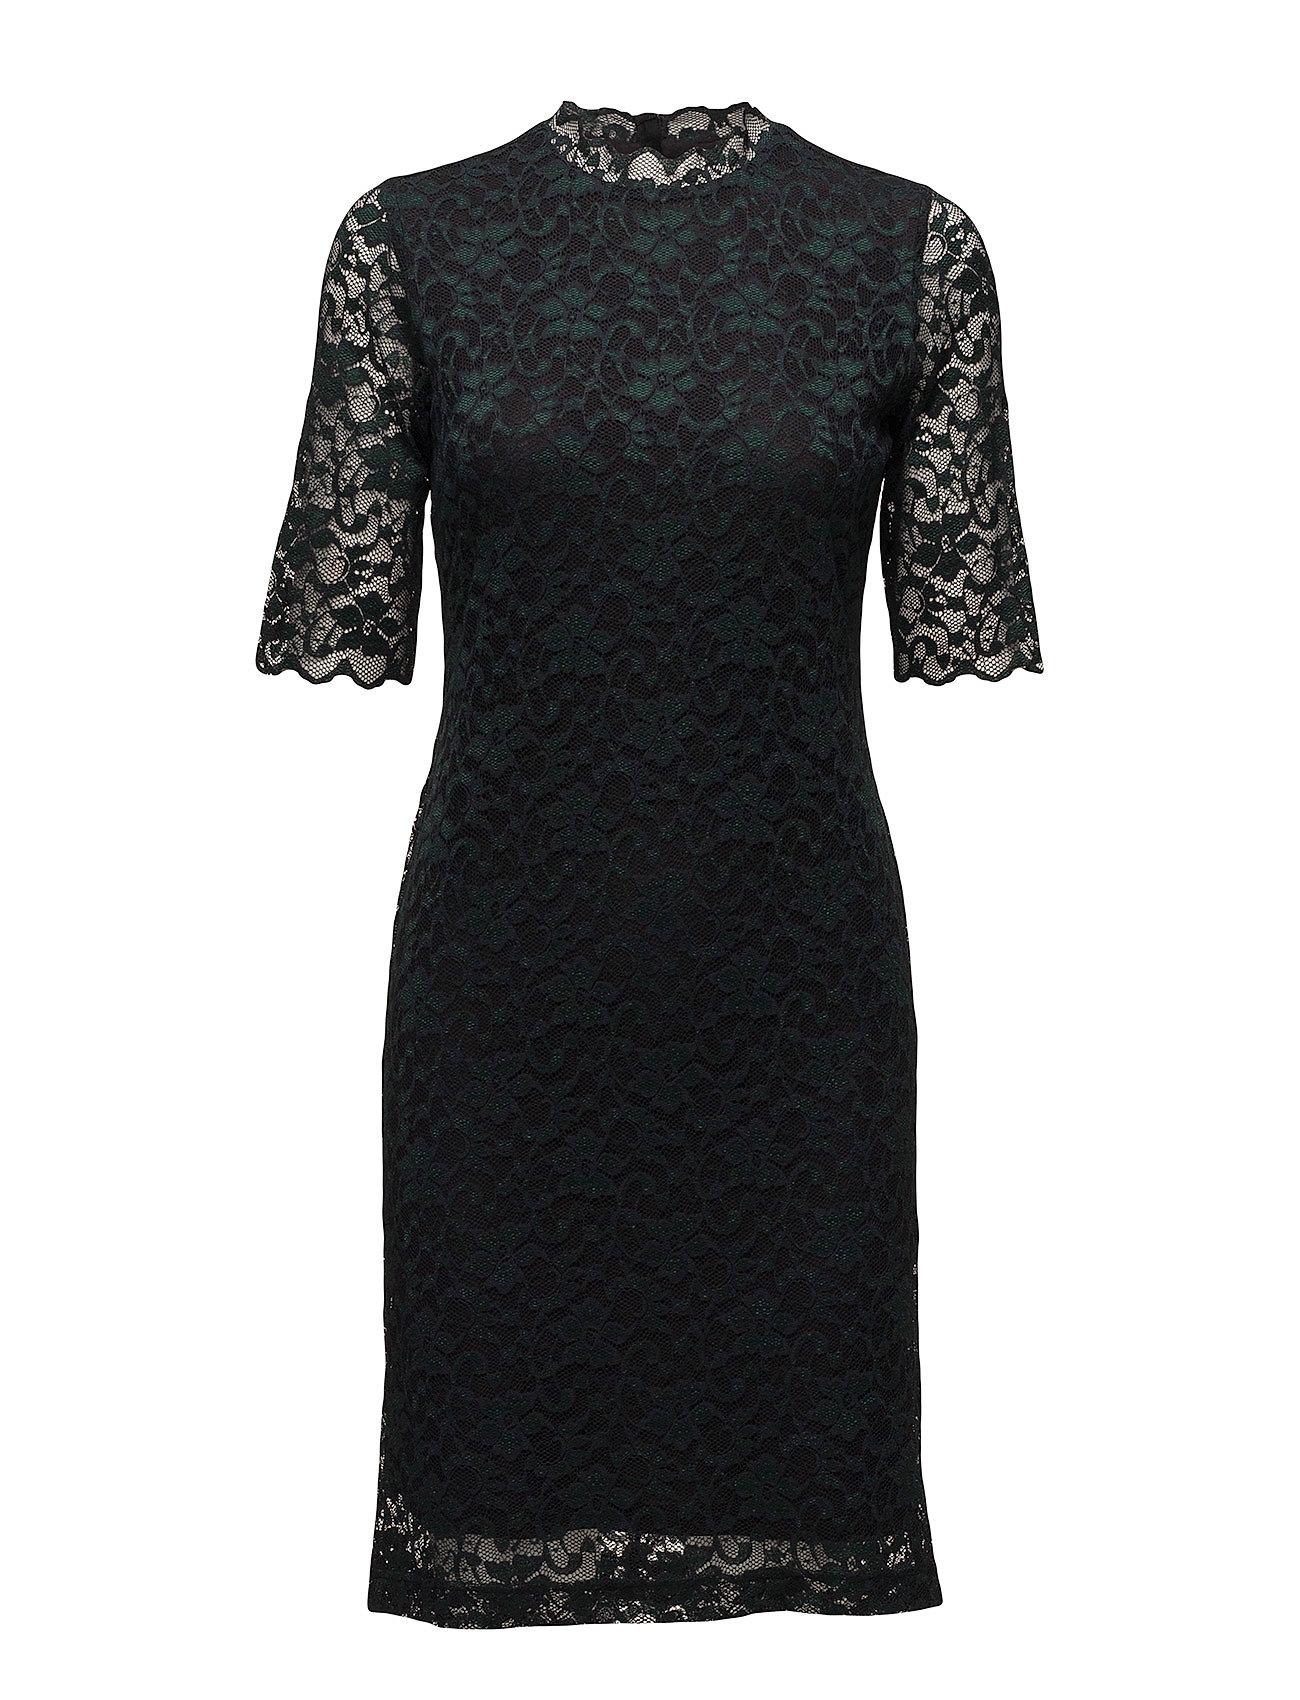 Zl Zeline Dress LwblackDeep TealInwear E29WHYeDI